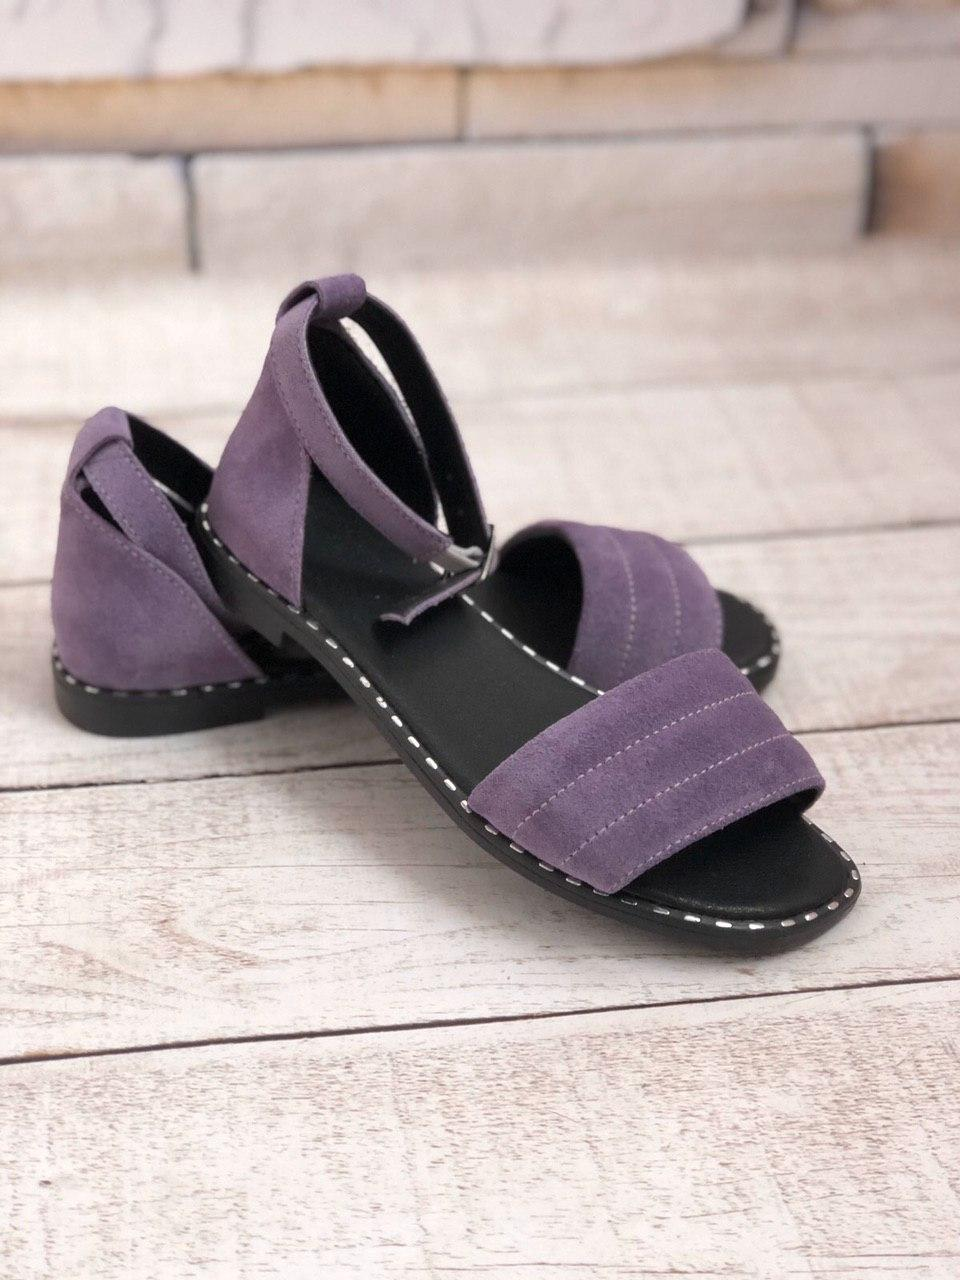 Замшеві босоніжки без каблука, шкіра або замша розміри 36-41